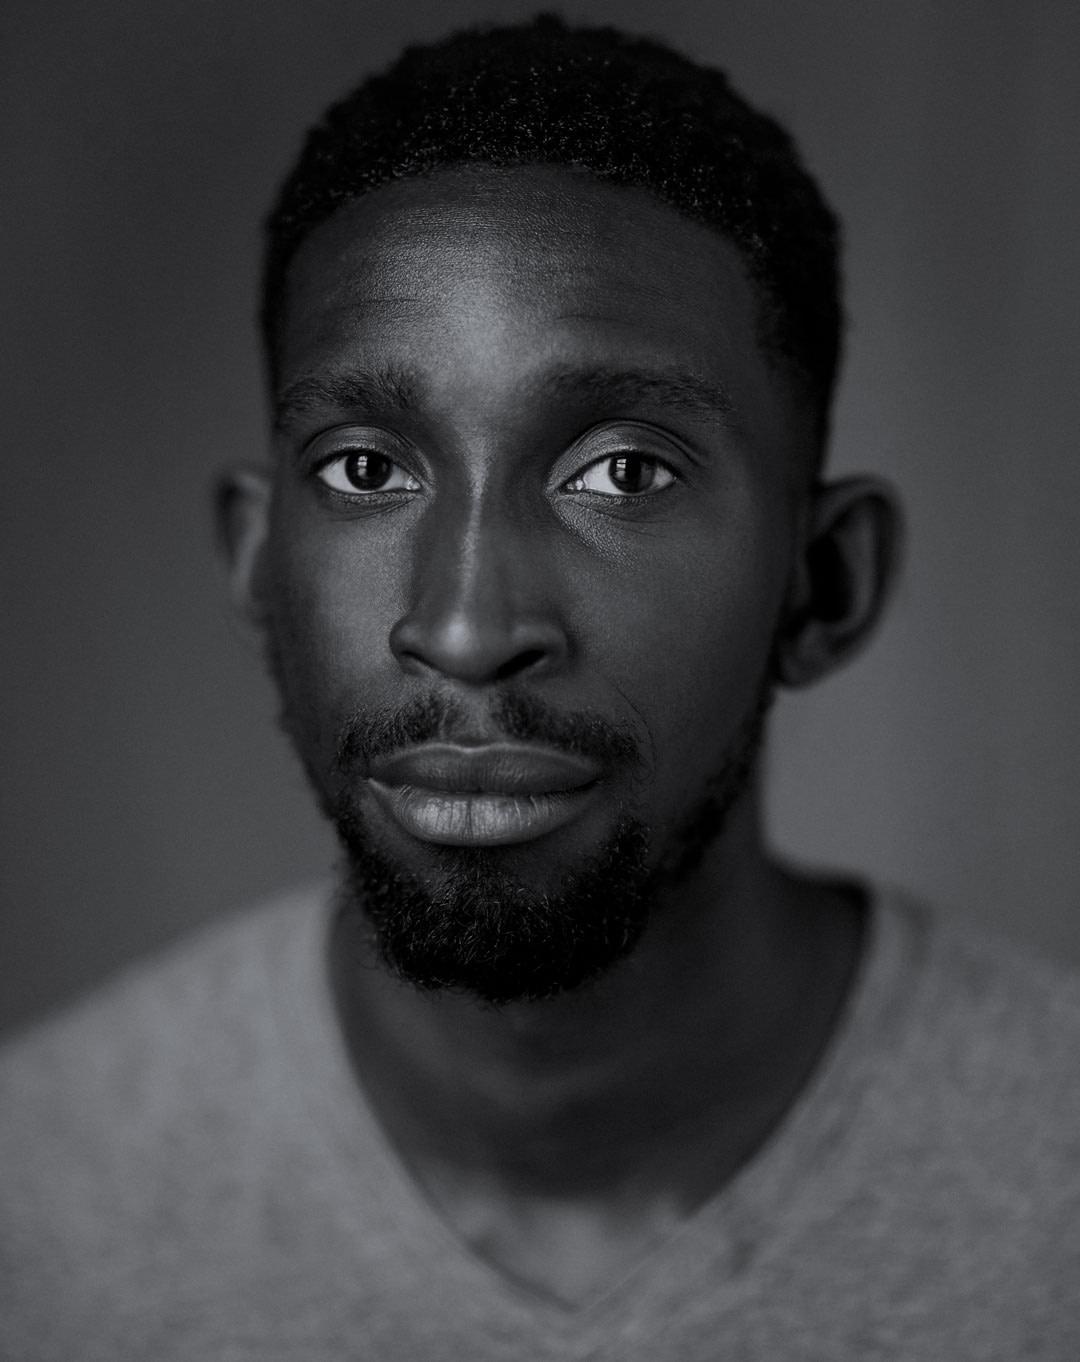 Nelson-Ekaragha-Portrait-Photography-April-Alexander-5v2-WEB